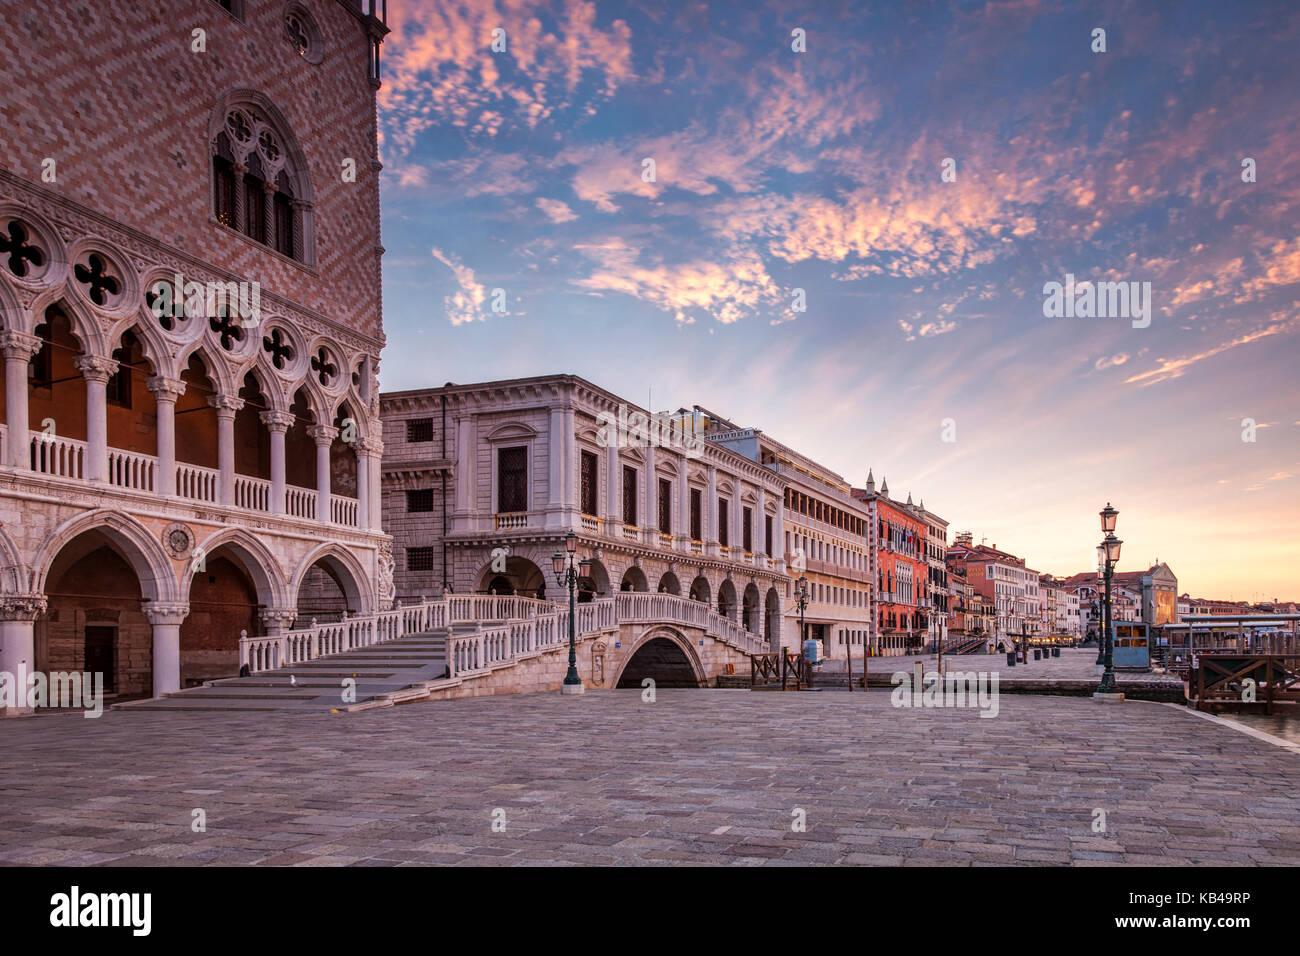 Die Promenade vor dem Dogenpalast in Venedig, Italien bei Sonnenaufgang Stockfoto